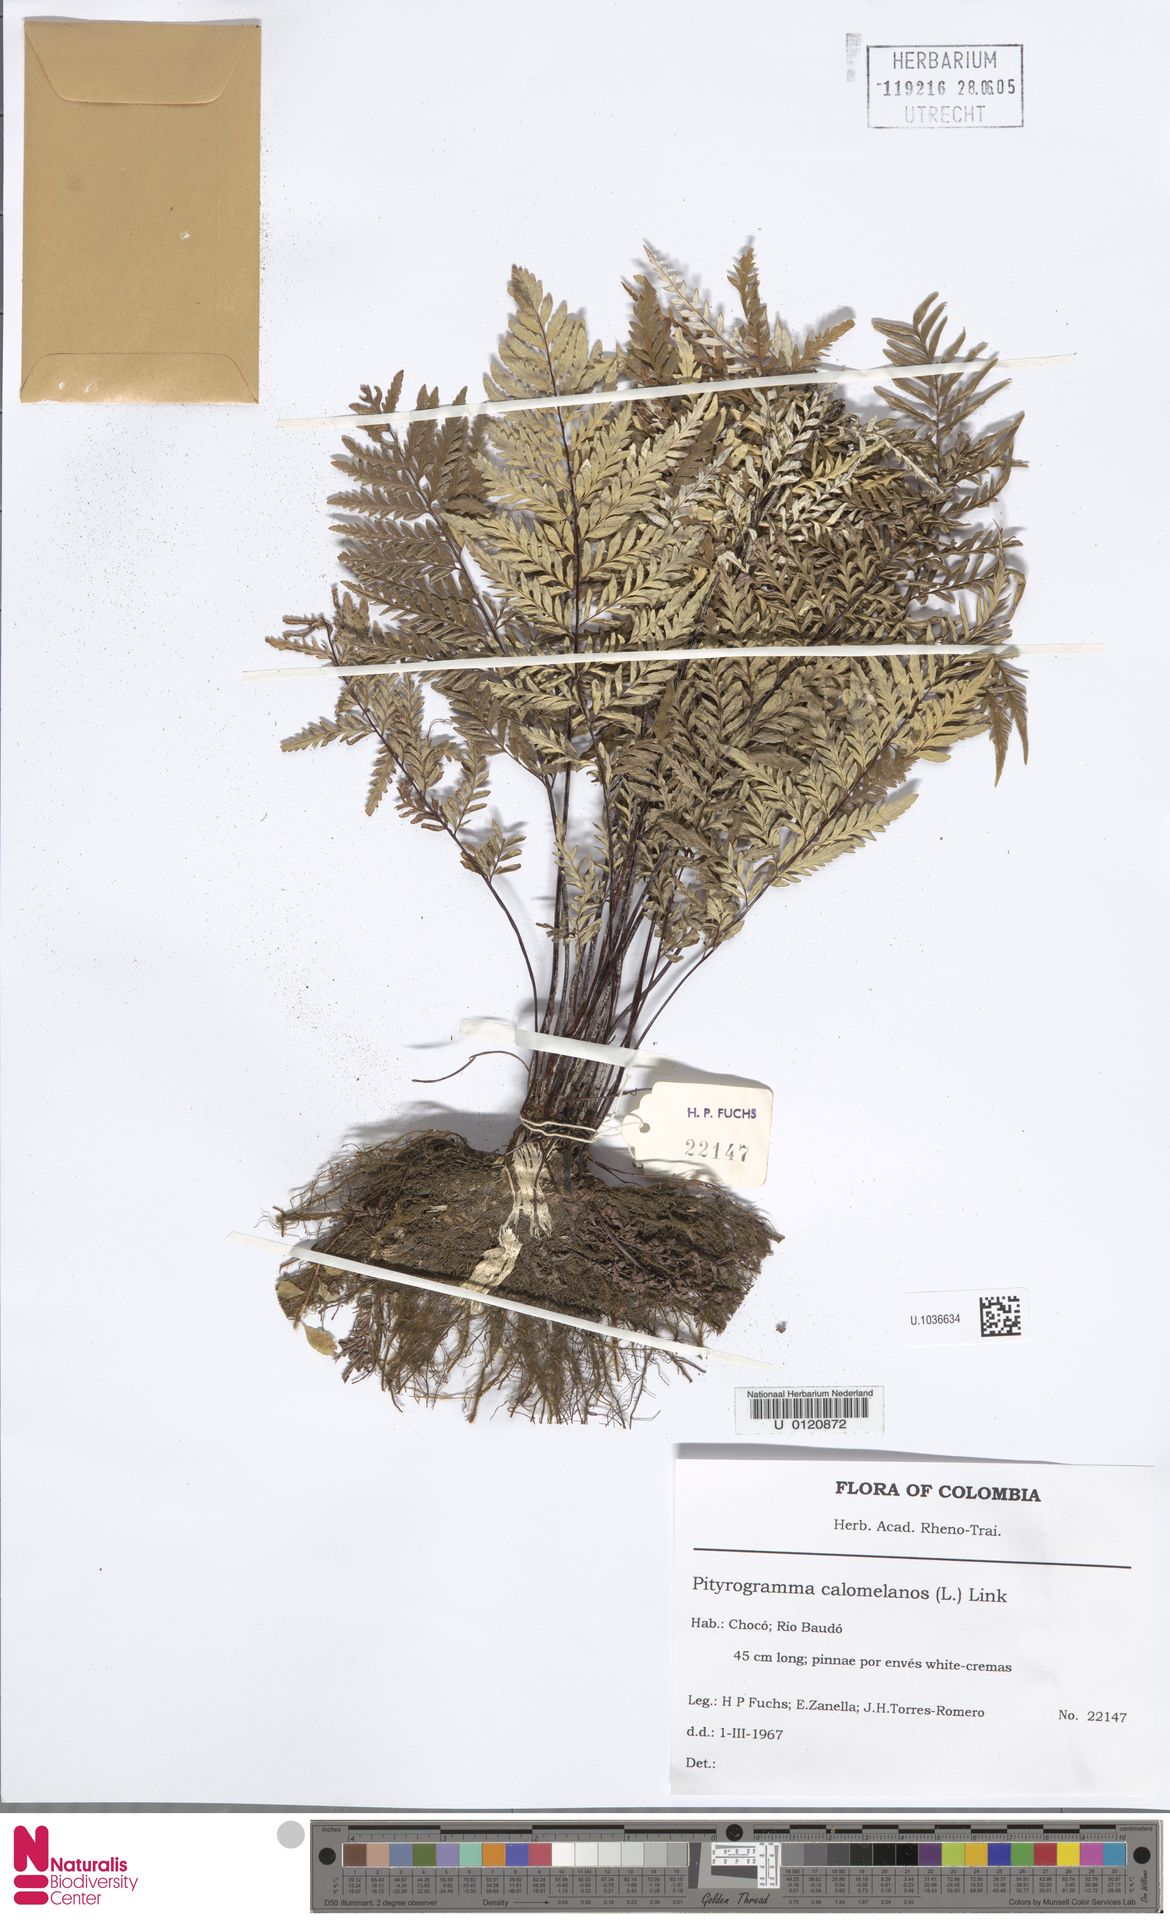 U.1036634 | Pityrogramma calomelanos (L.) Link